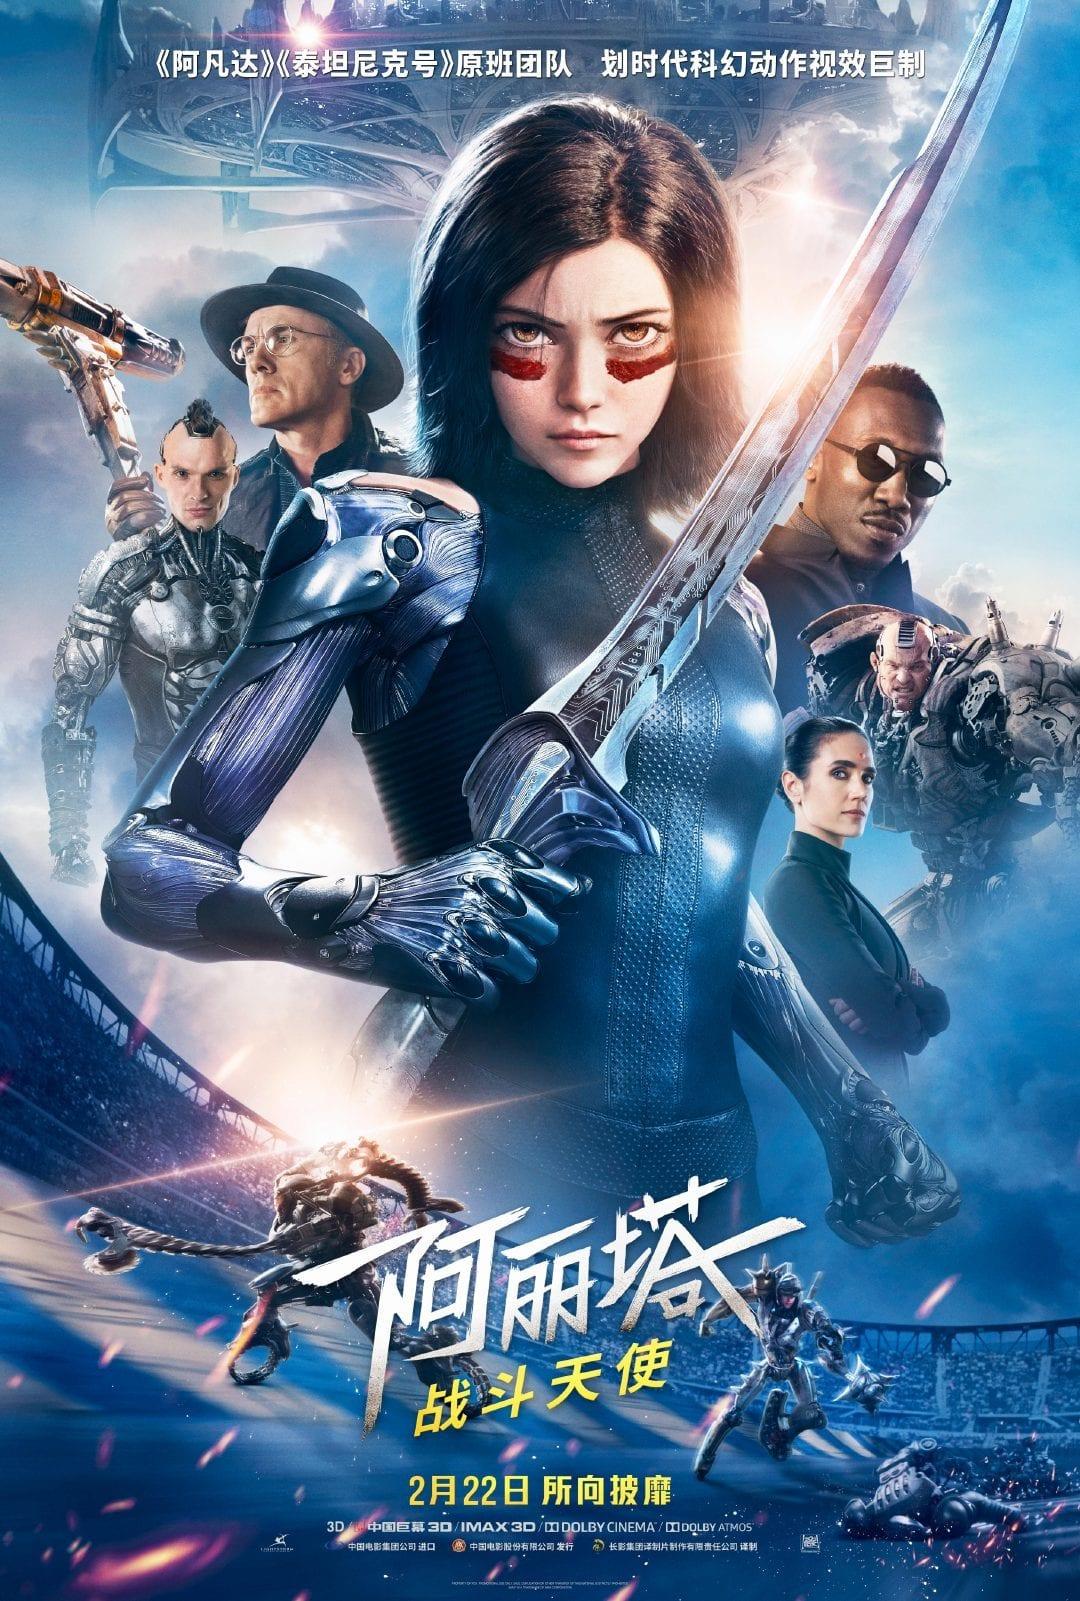 Watch New Alita Battle Angel International Poster And Trailer